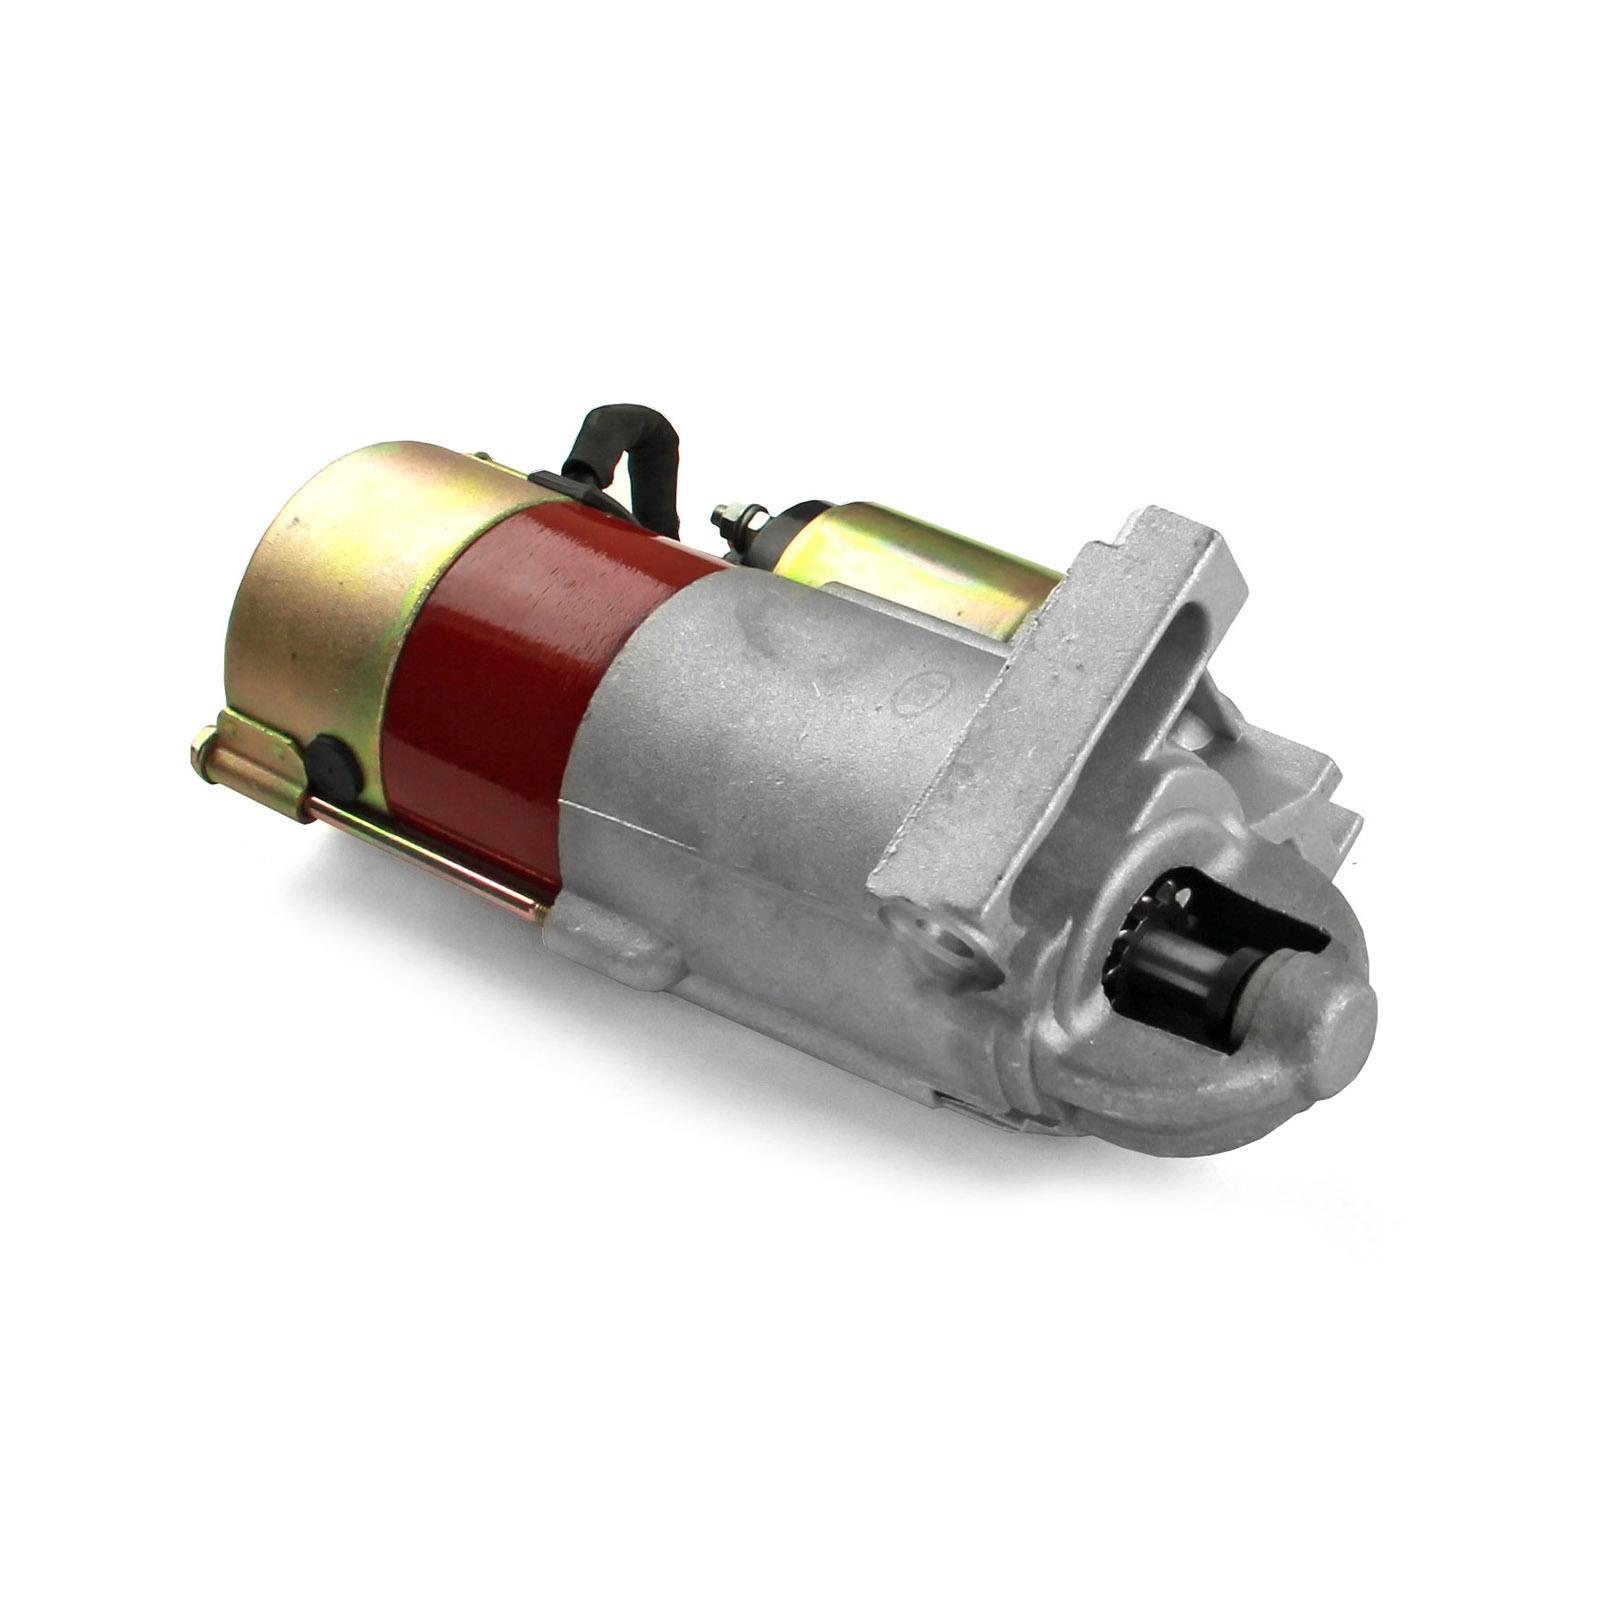 "Chevy SBC 350 BBC 454 10"" 153T Straight High Torque Starter Motor"